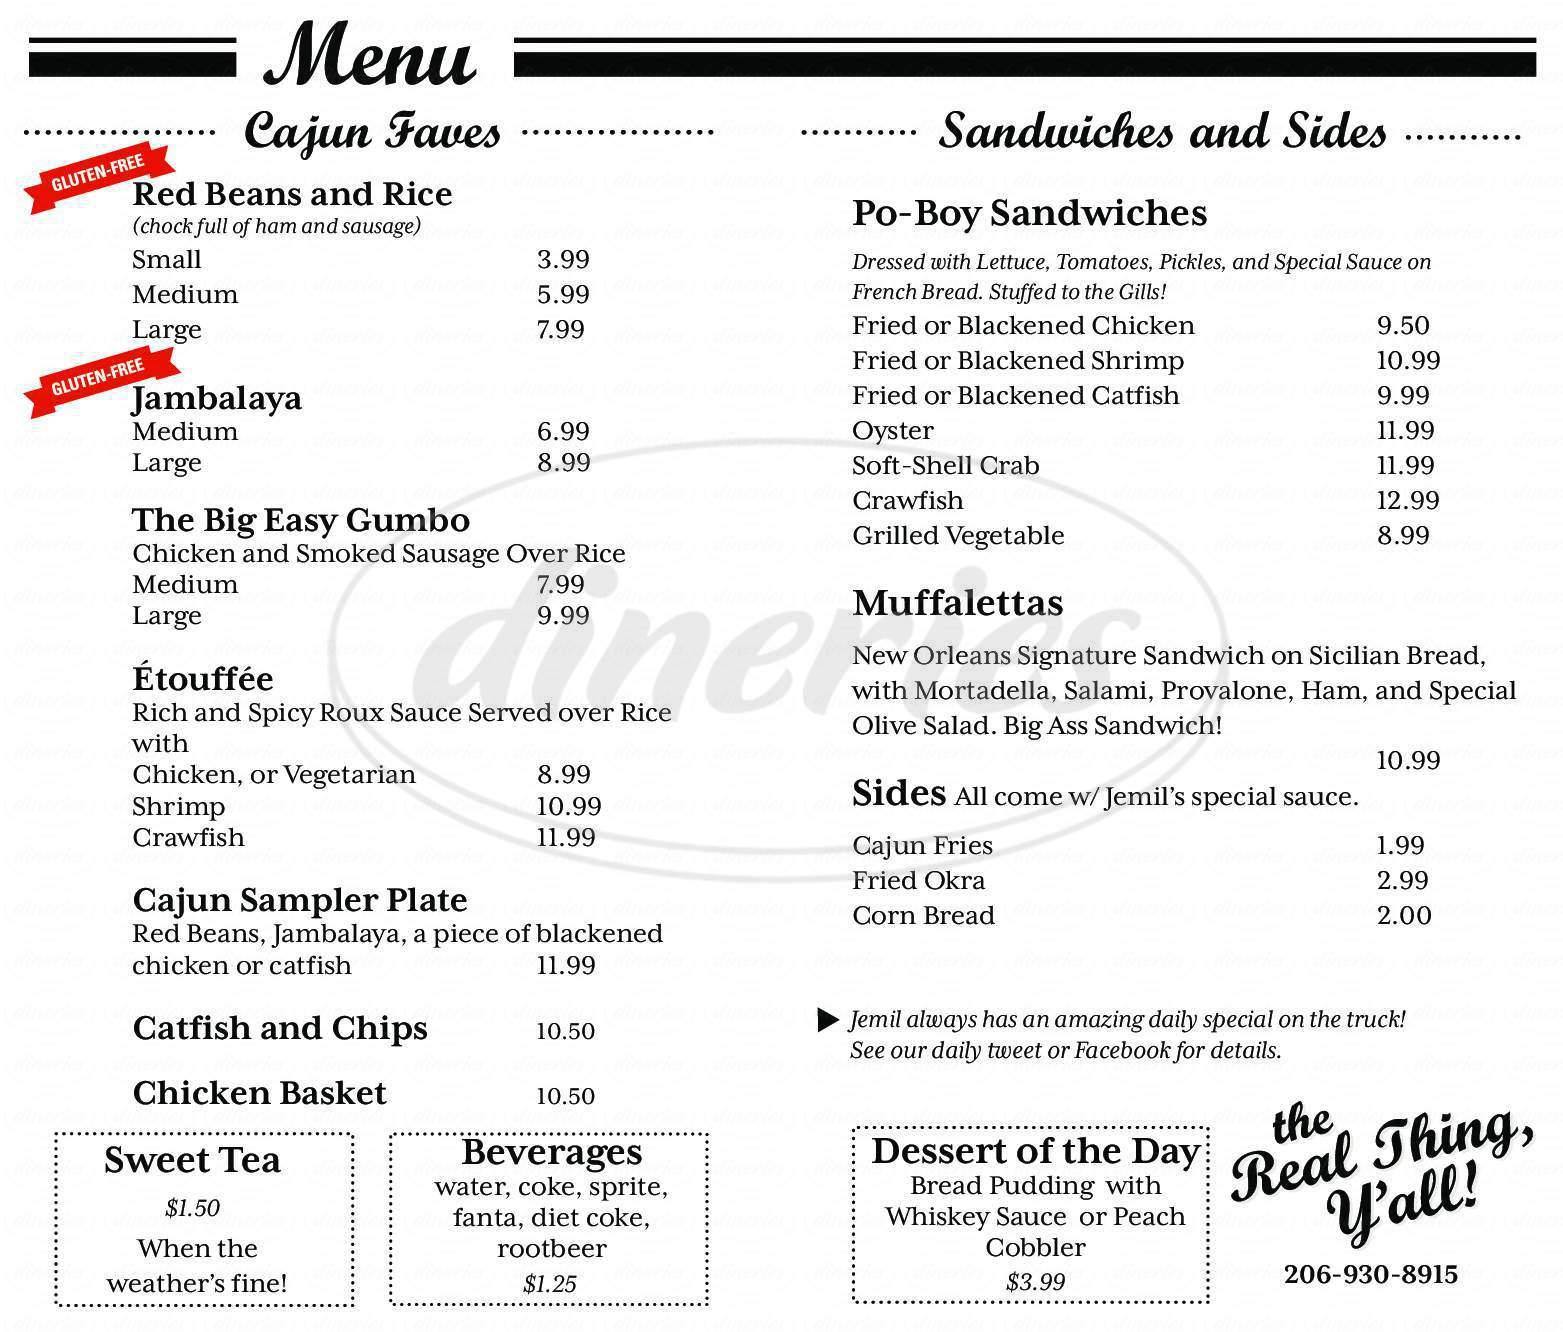 menu for Jemil's Big Easy